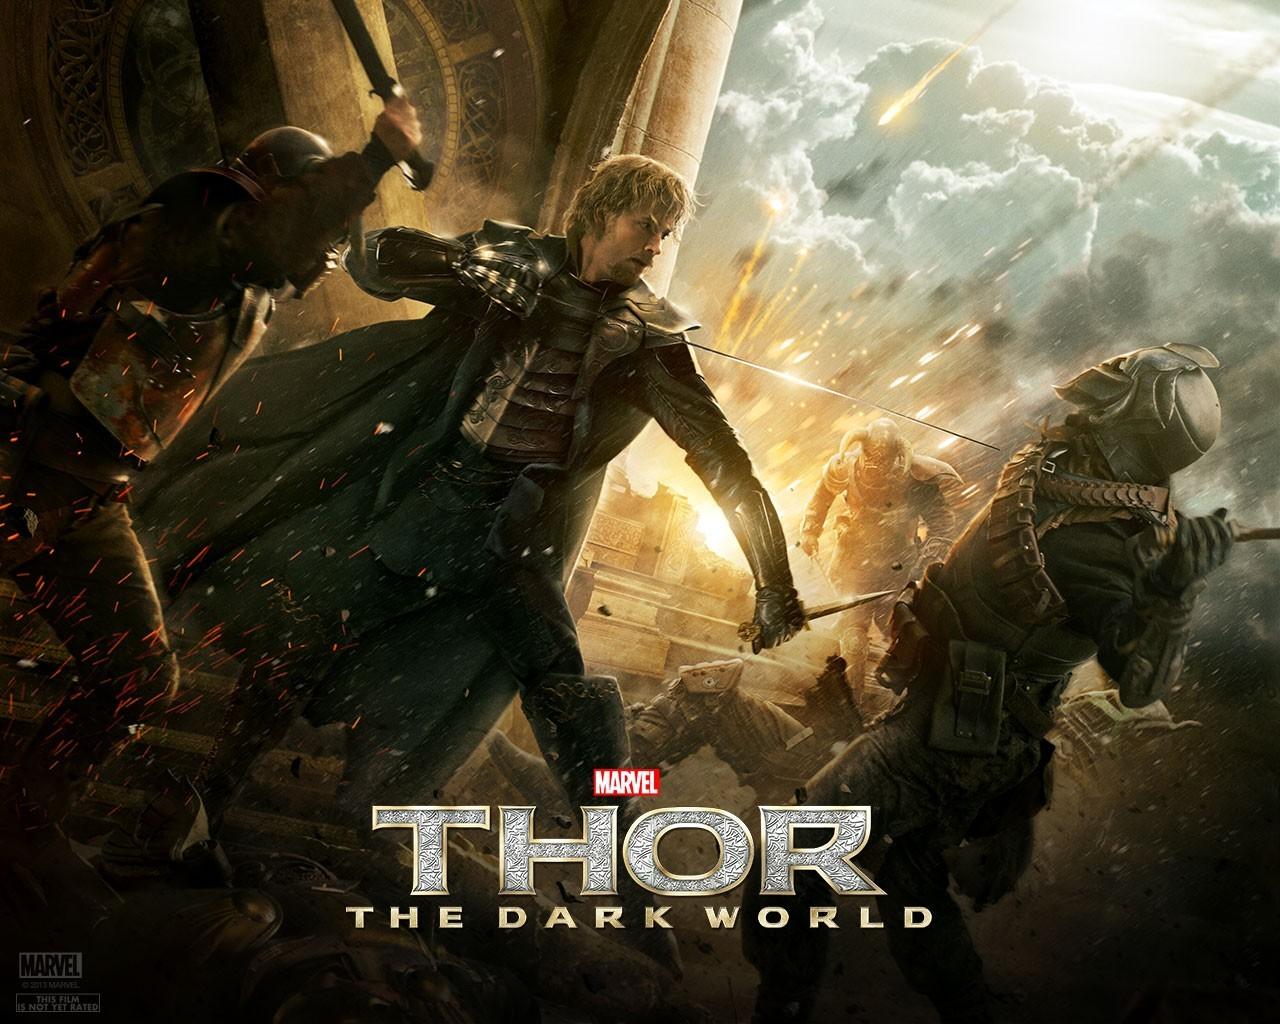 Free Download Thor The Dark World Wallpaper 23 1280 X 1024